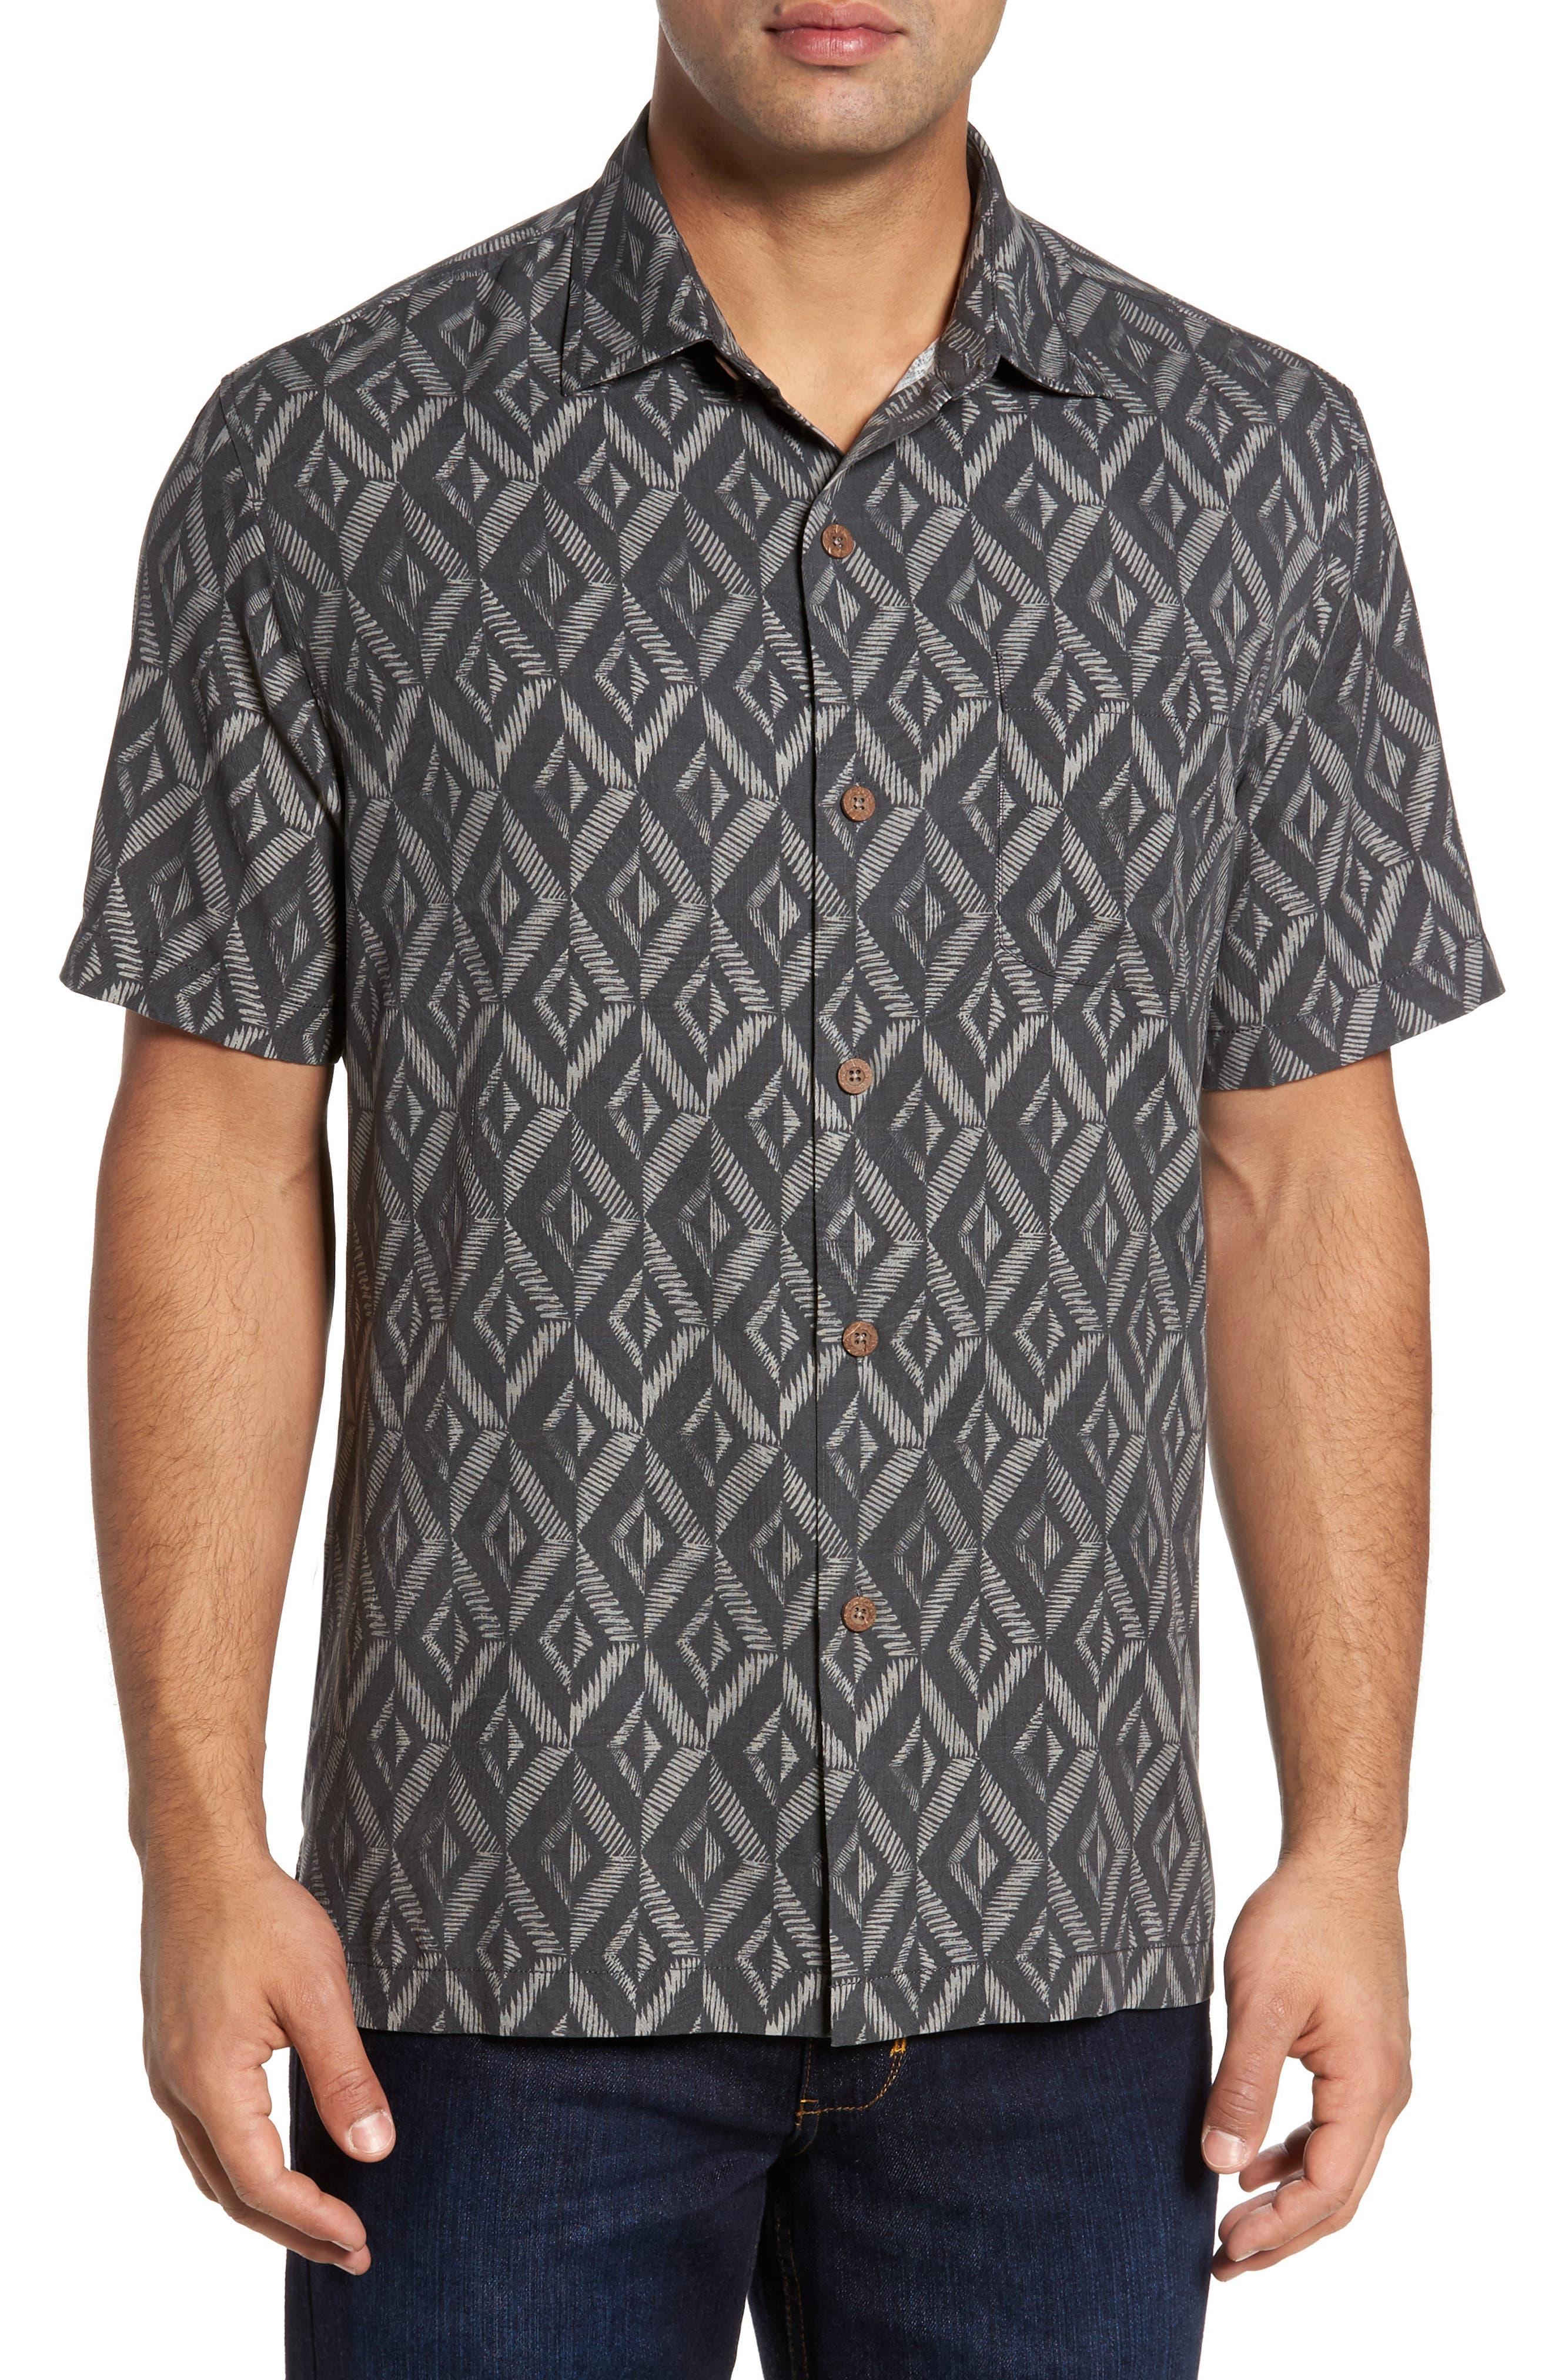 Alternate Image 1 Selected - Tommy Bahama Diamond Tiles Standard Fit Silk Blend Camp Shirt